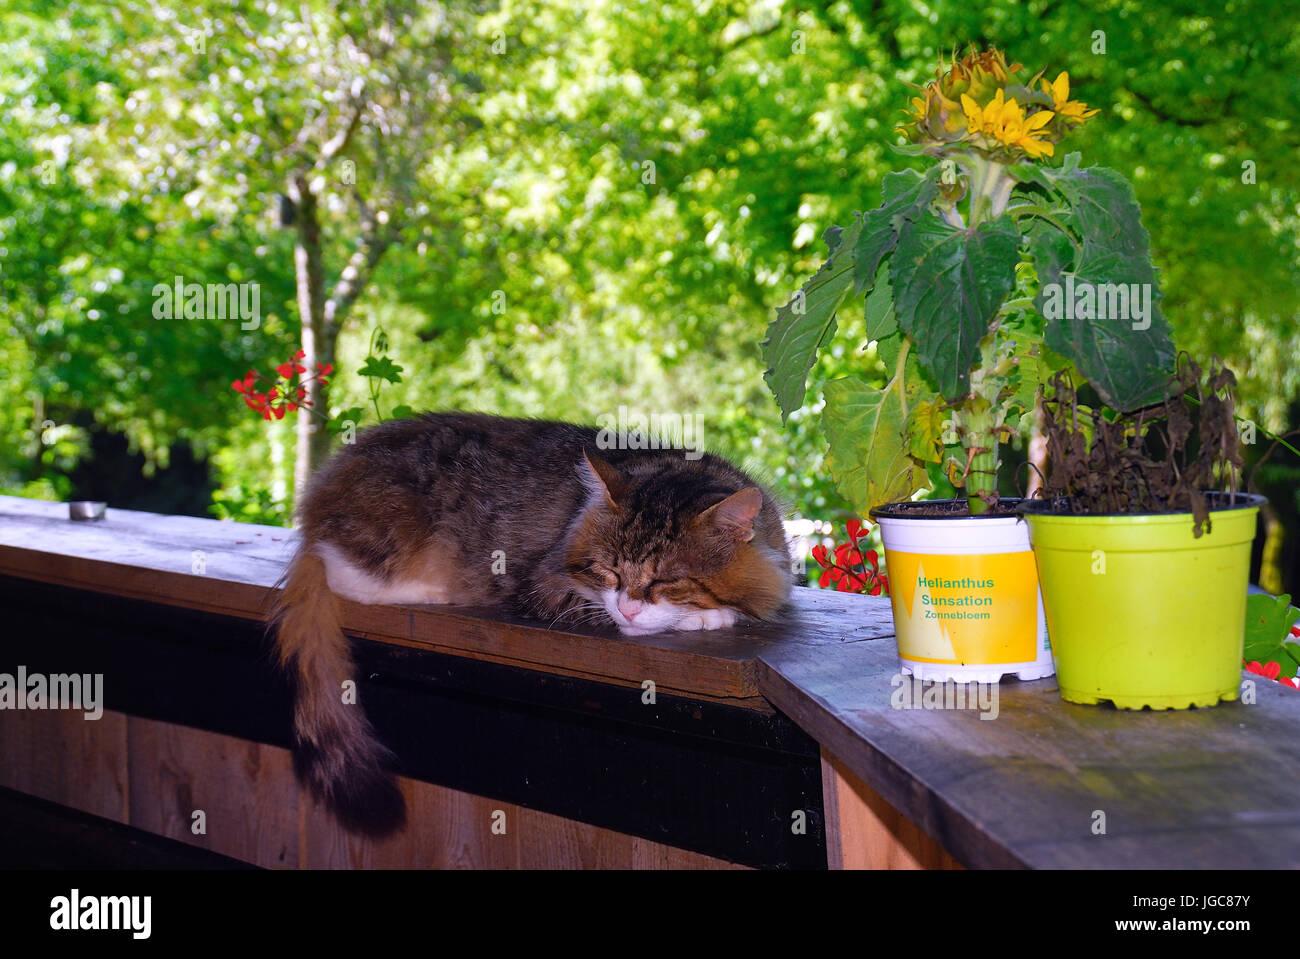 Slovenia, Soca valley, Volarje village. A cat sleeps on the windowsill of reception of Camp Vili camping. - Stock Image